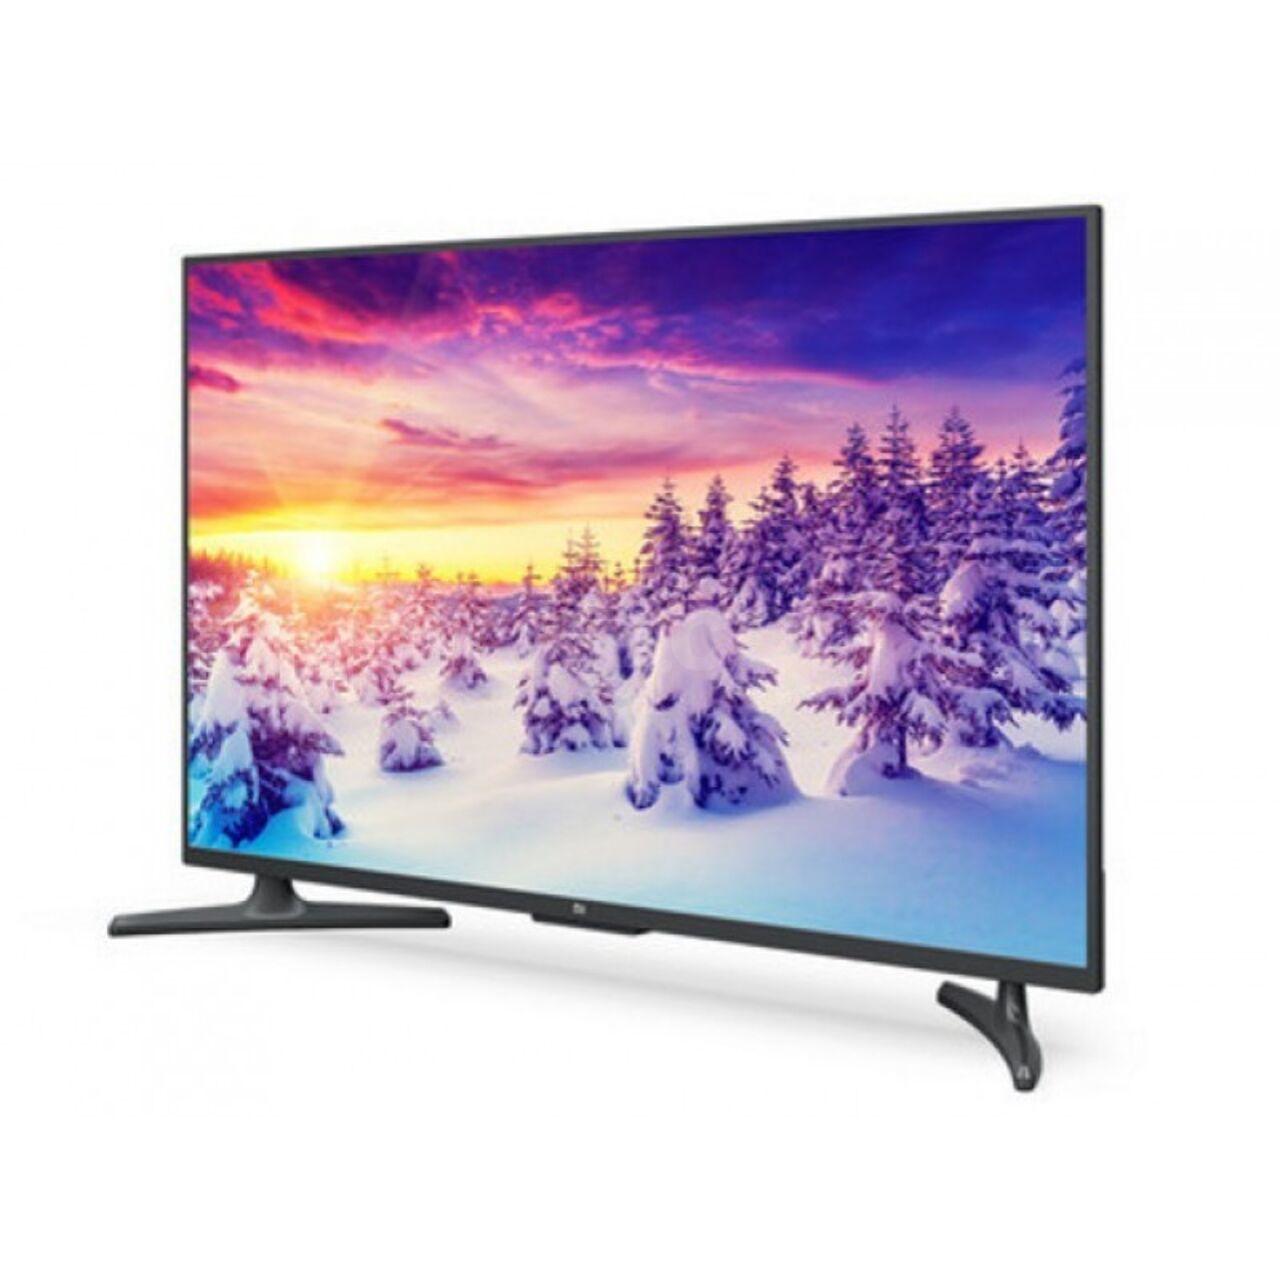 xiaomi mi tv телевизор купить